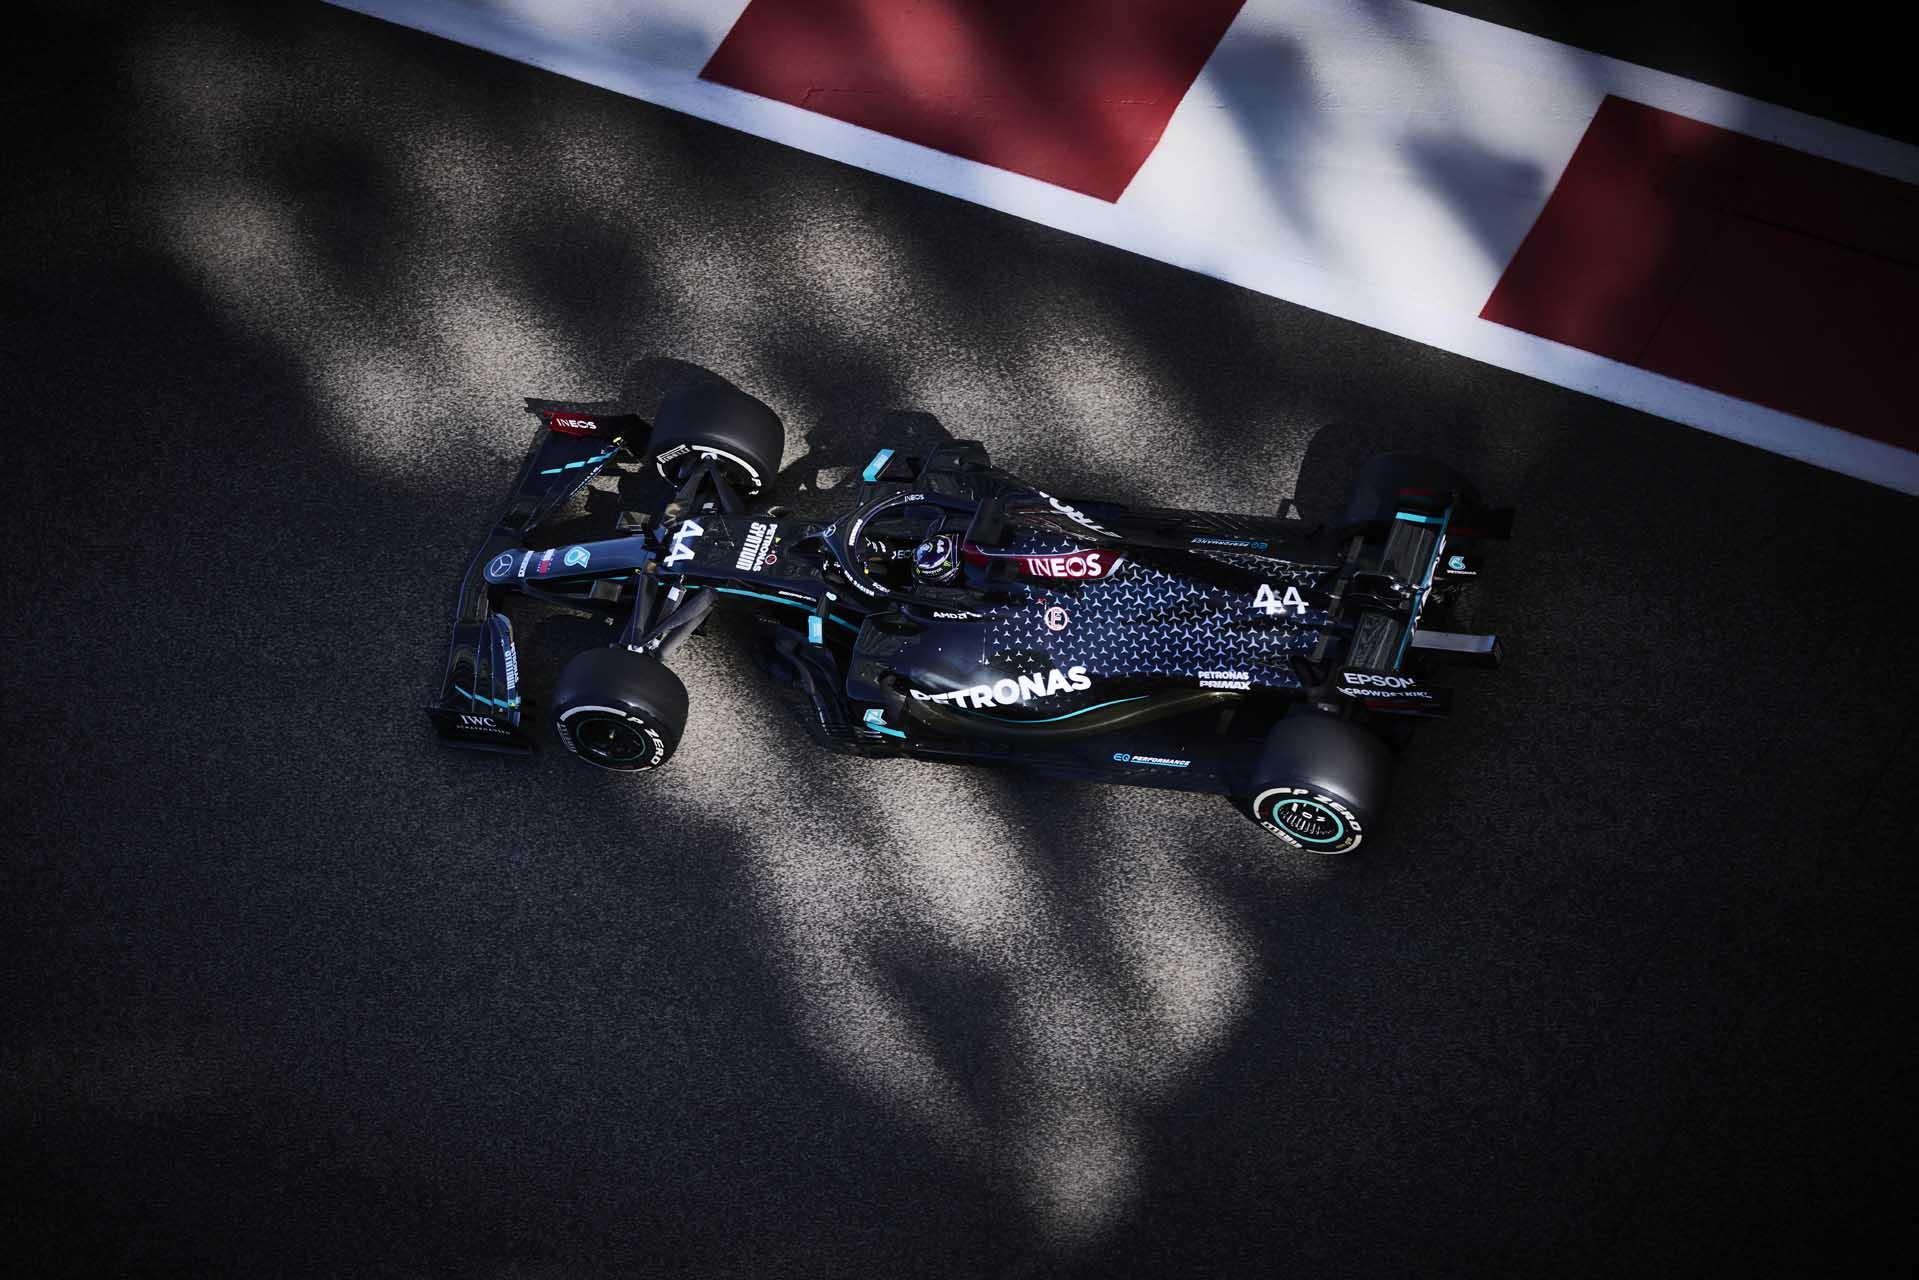 2020 Abu Dhabi Grand Prix, Friday - Steve Etherington